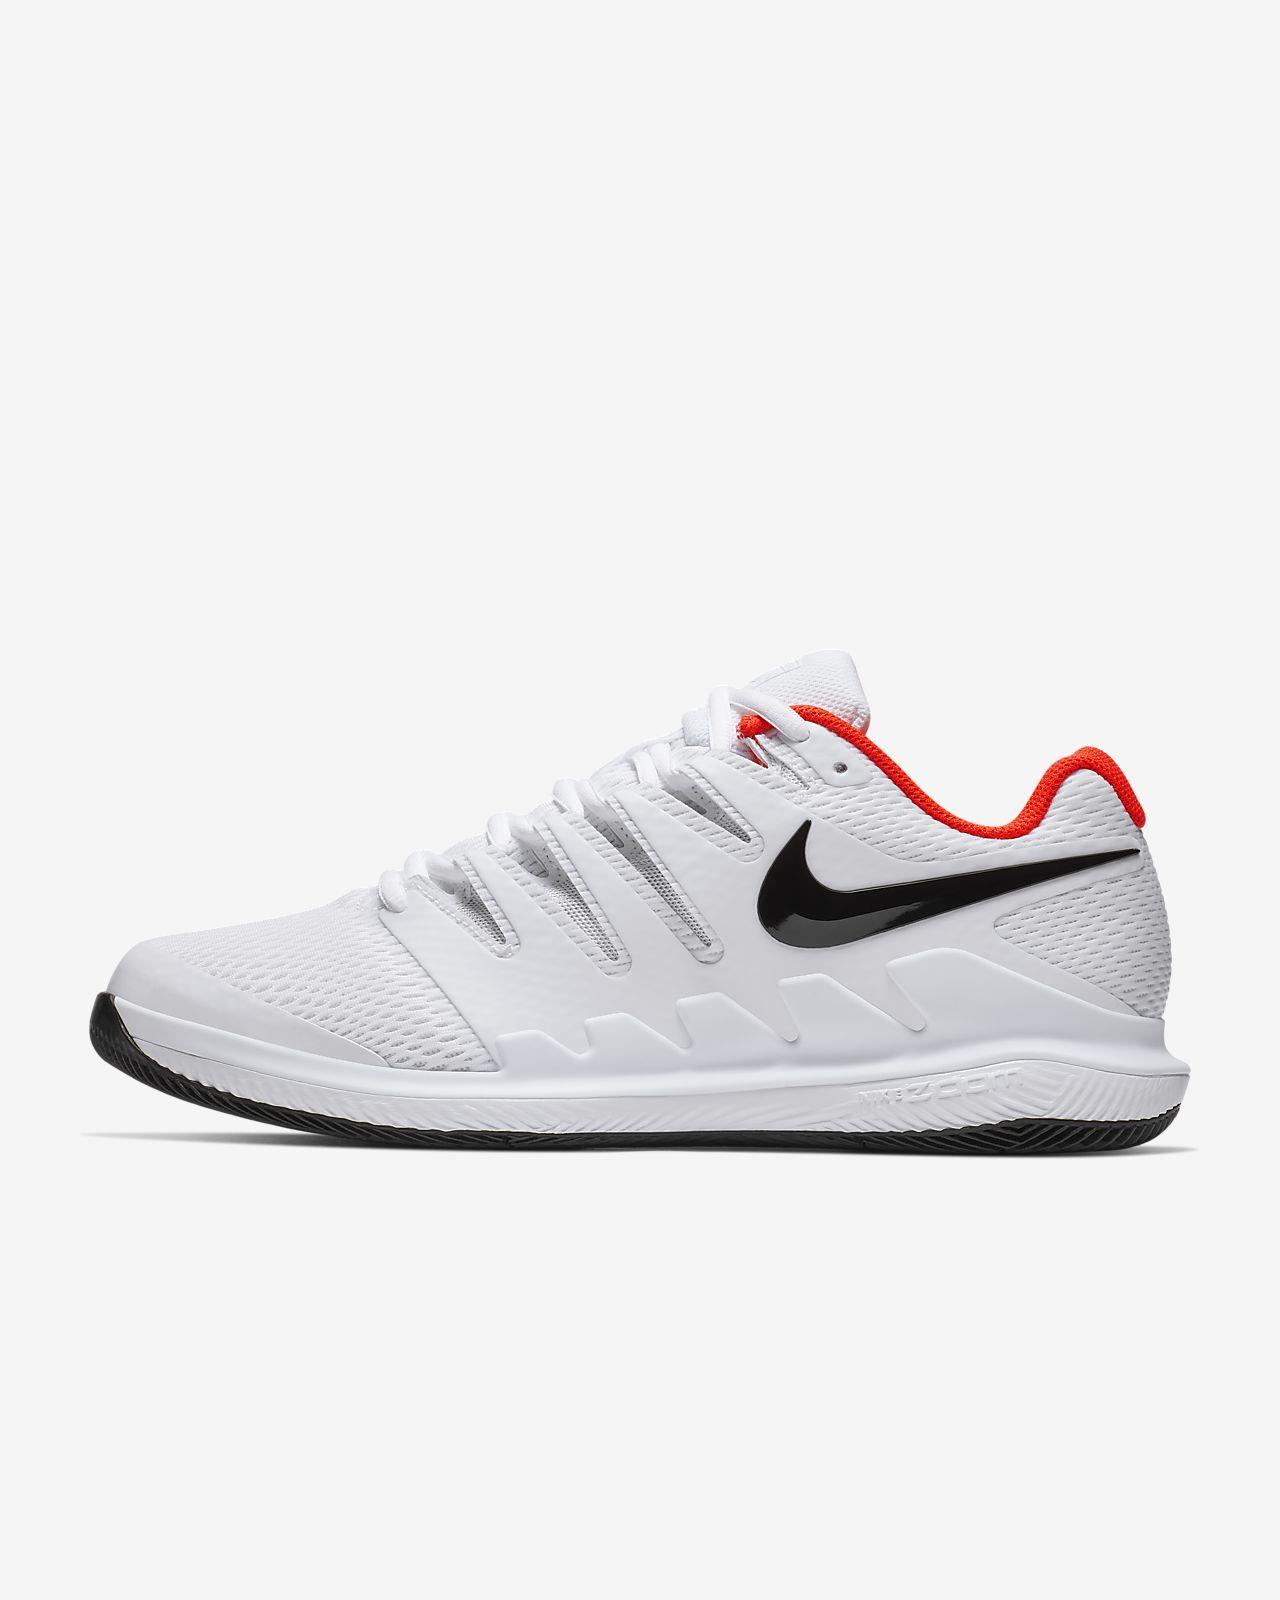 Tienda Nike zapatillas para hombre court zoom vapor 9.5 tour